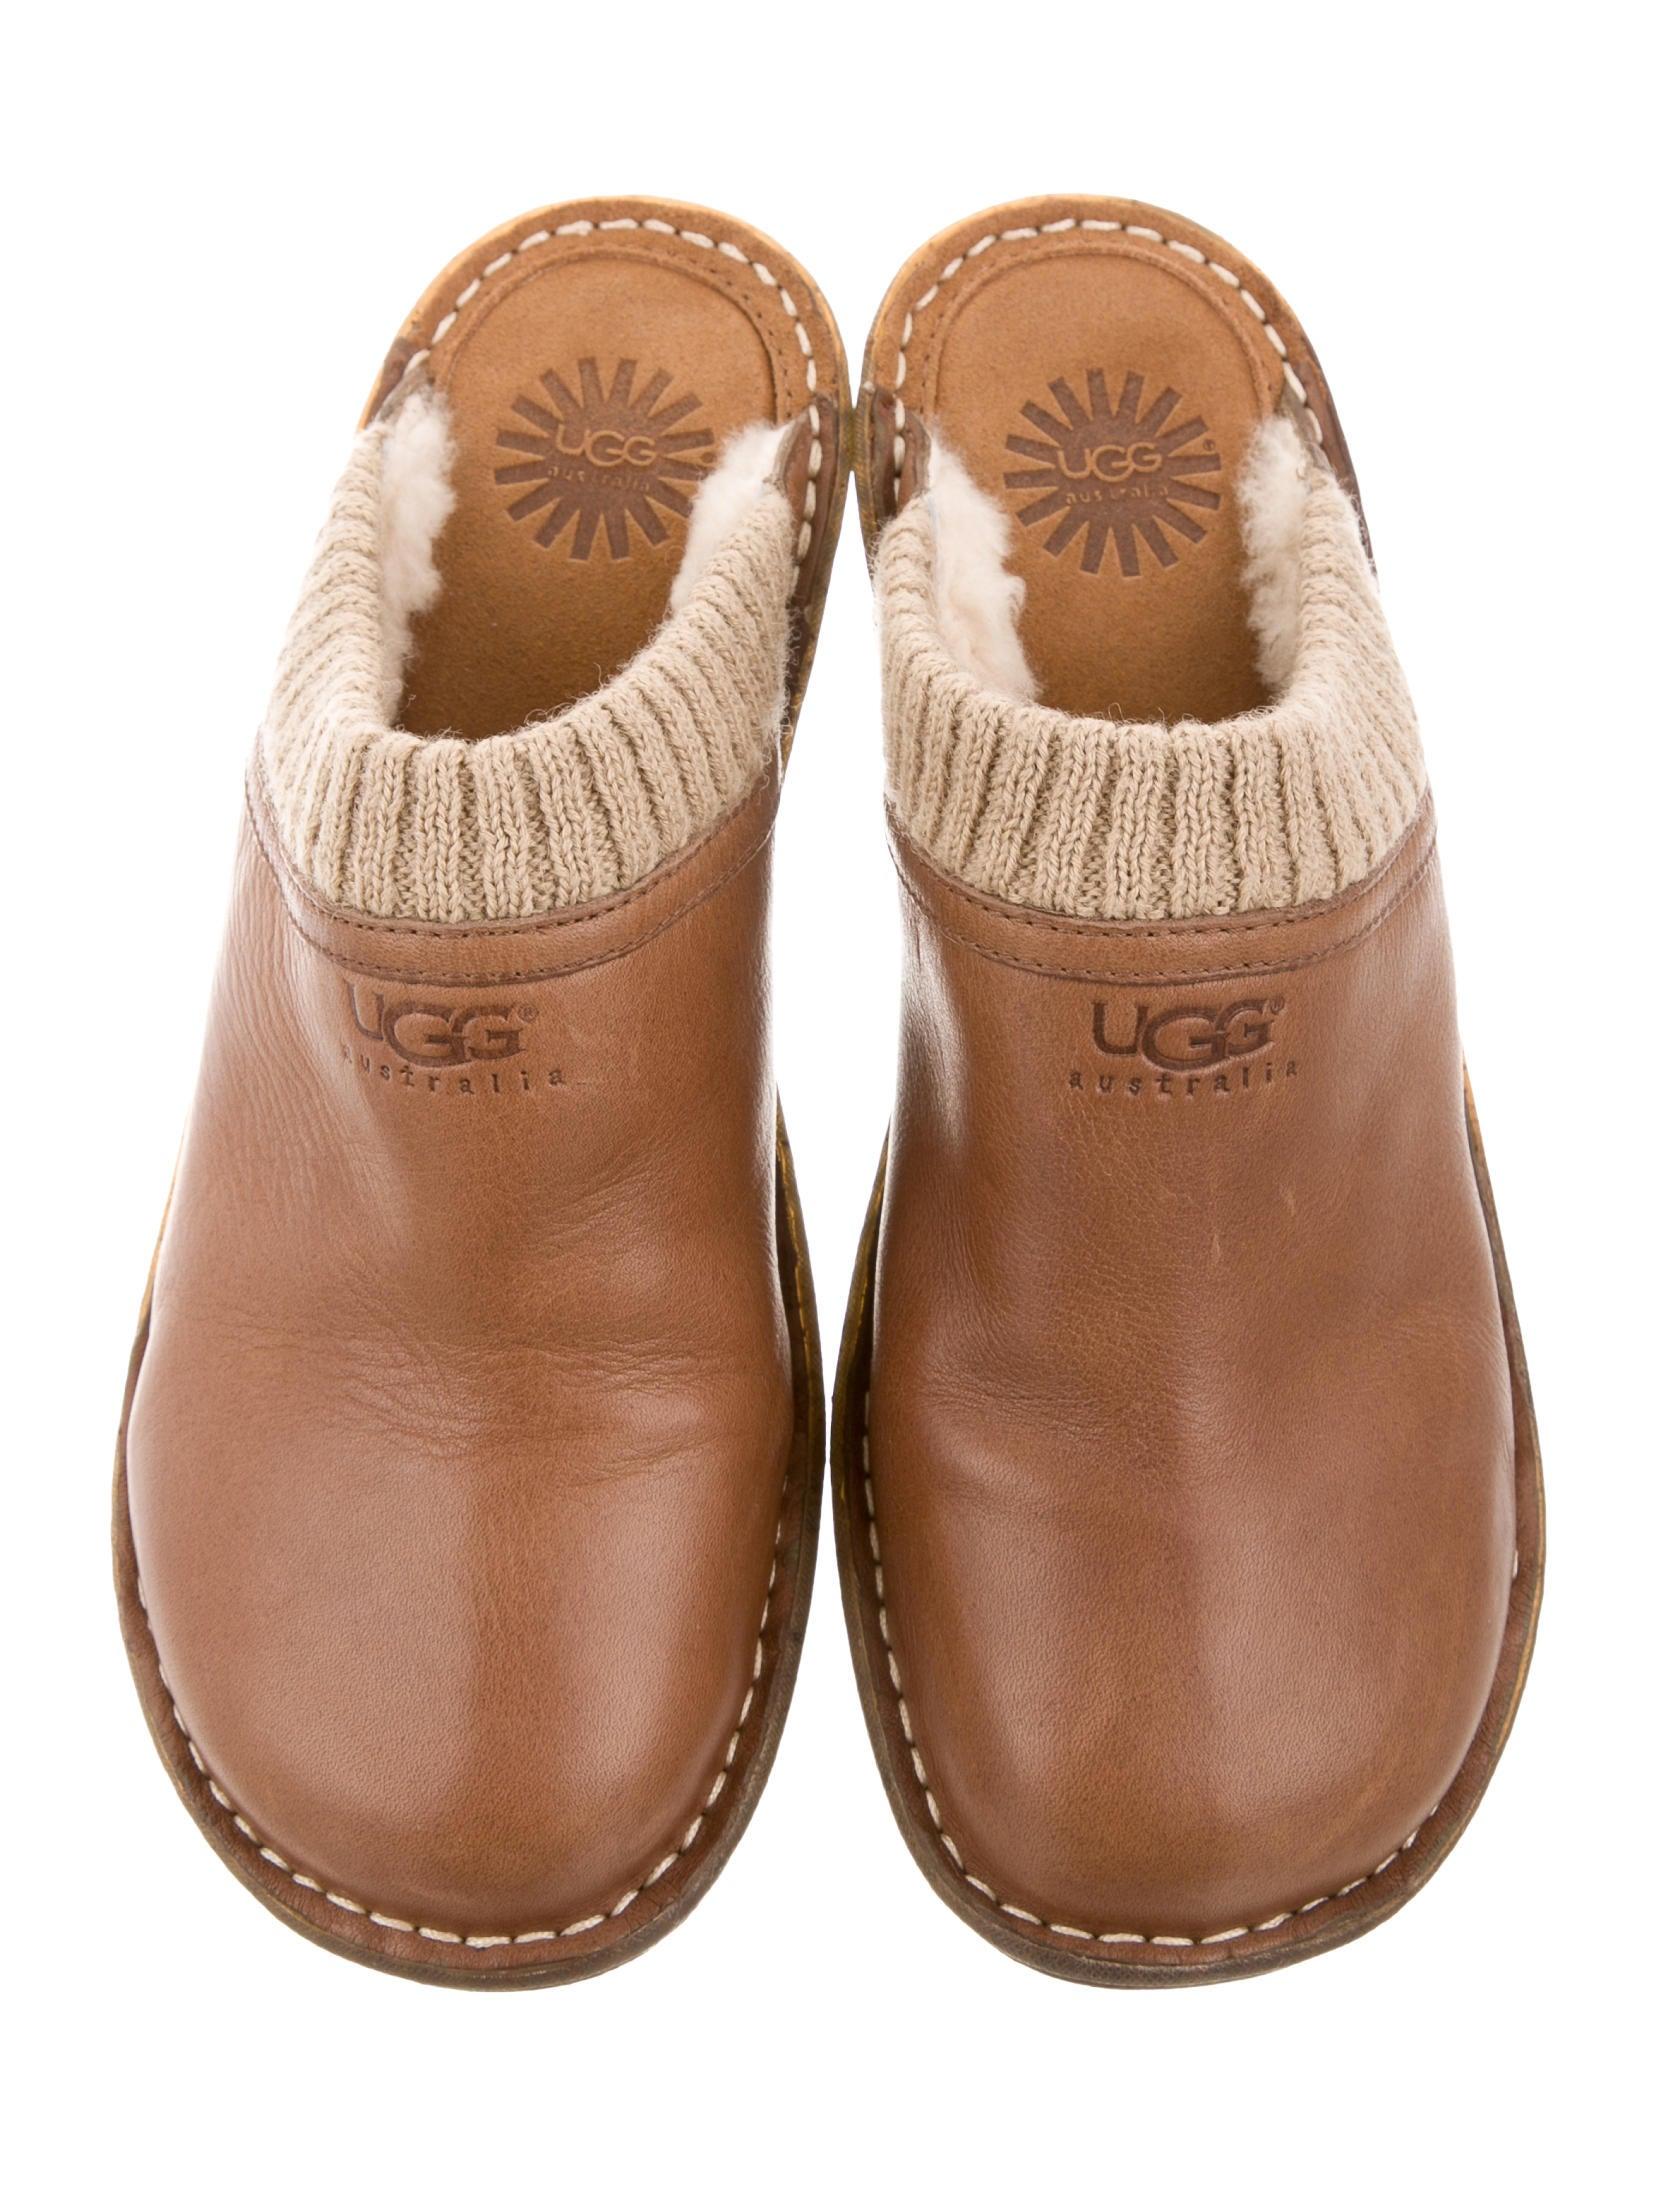 UGG Australia Leather Round-Toe Mules - Shoes - WUUGG22962 ...